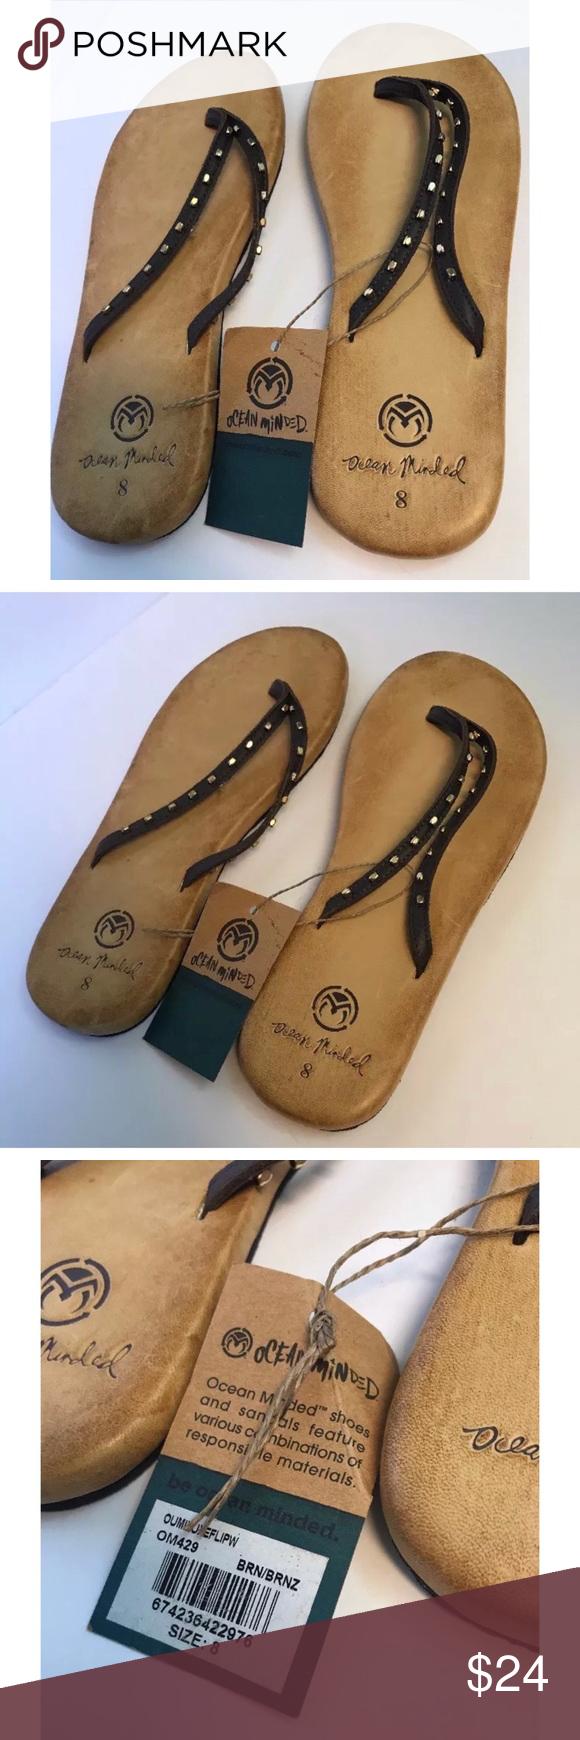 19083726211f Crocs Ocean Minded Leather Flip Flops 8 Oumi Luxe Ocean Minded By Crocs  Women s US Size 8 leather flip flops